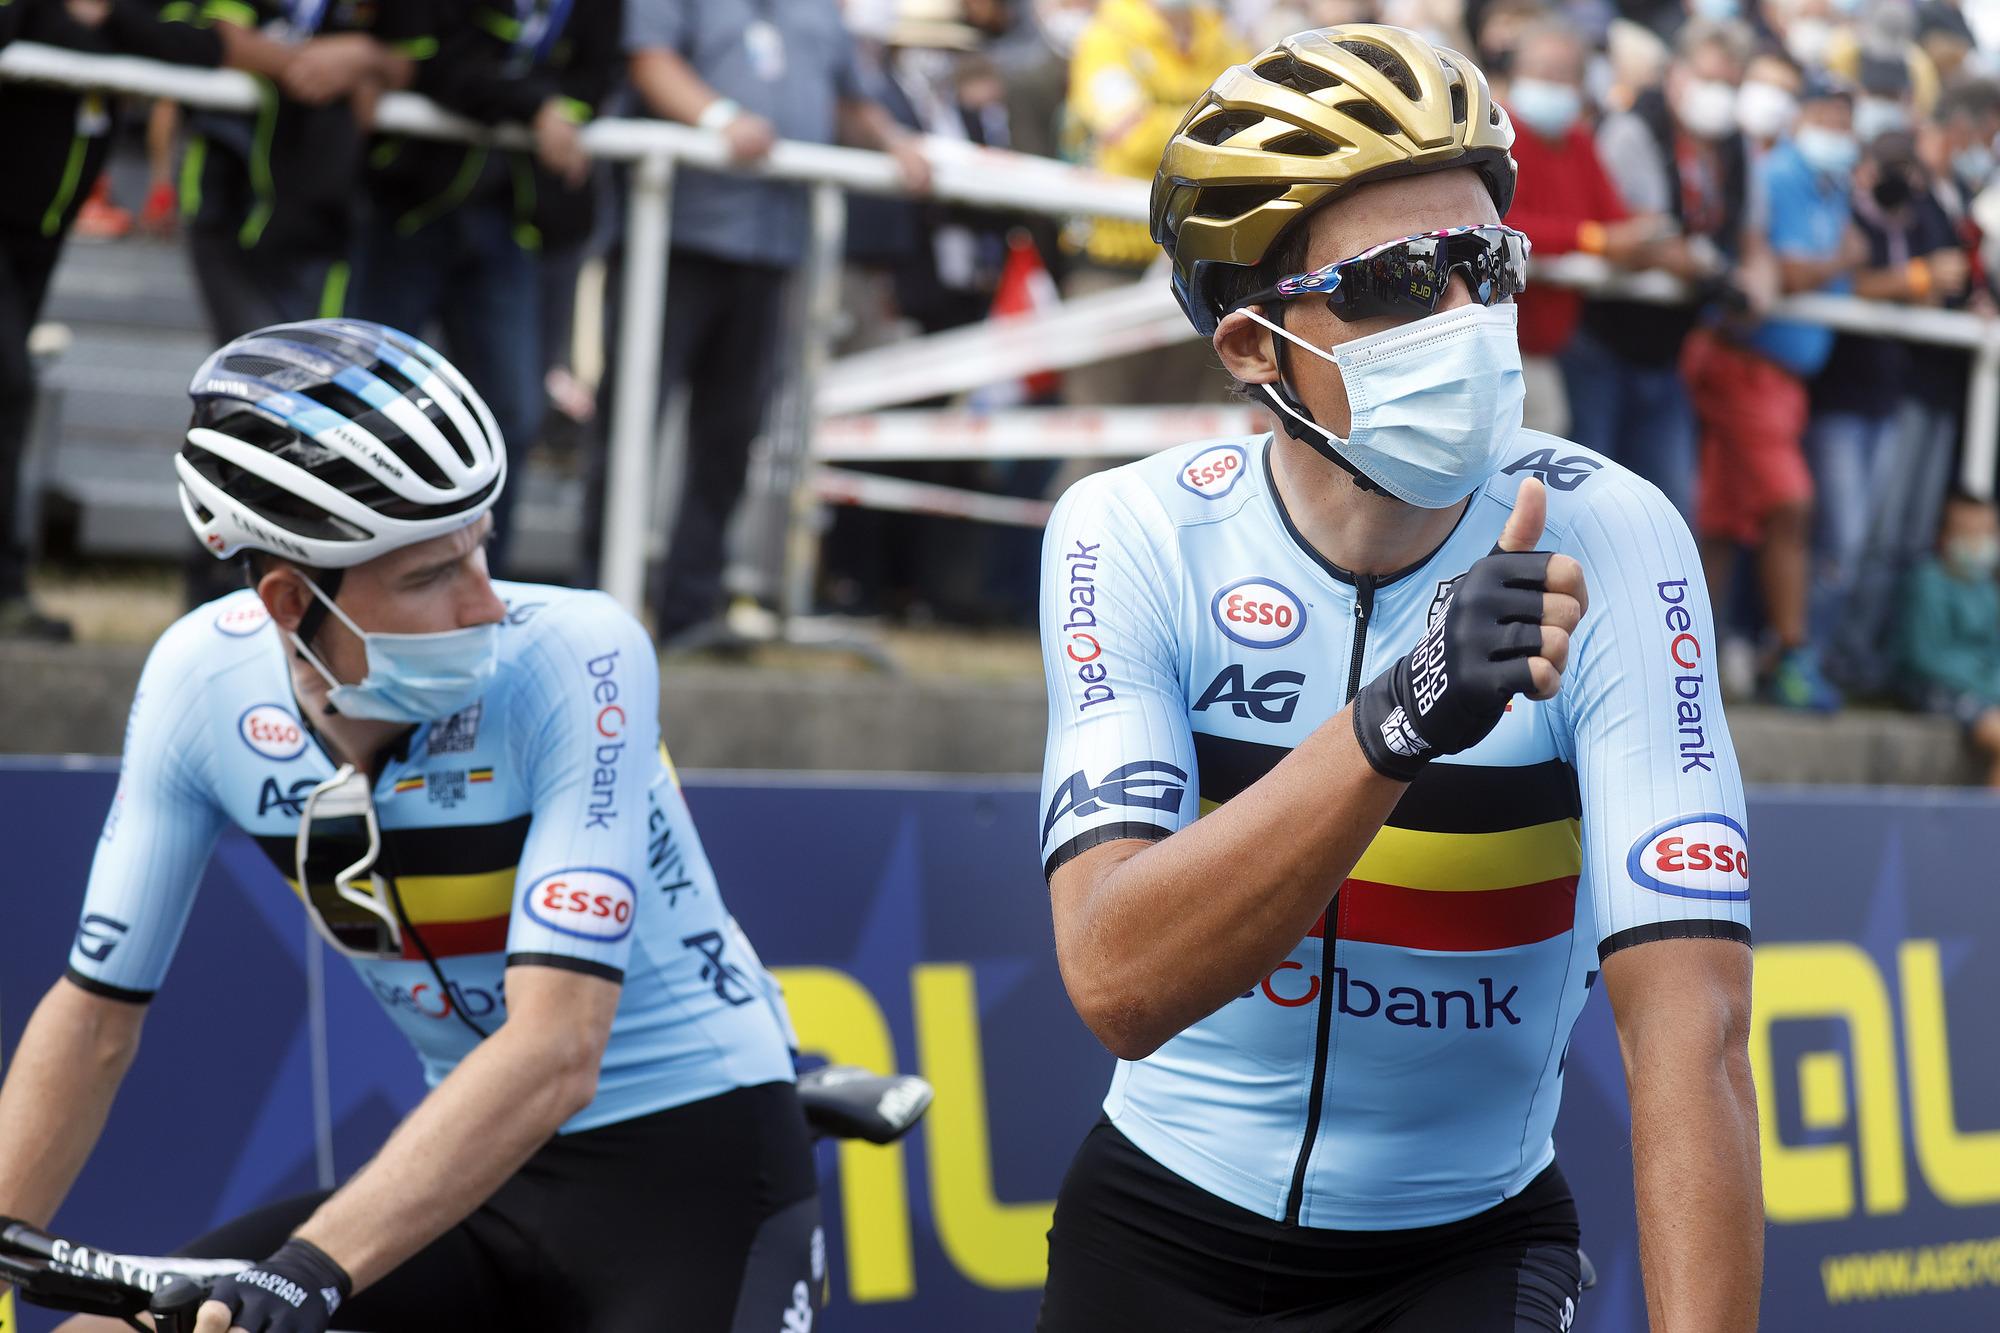 Greg van Avermaet seemed ready to lead Belgium